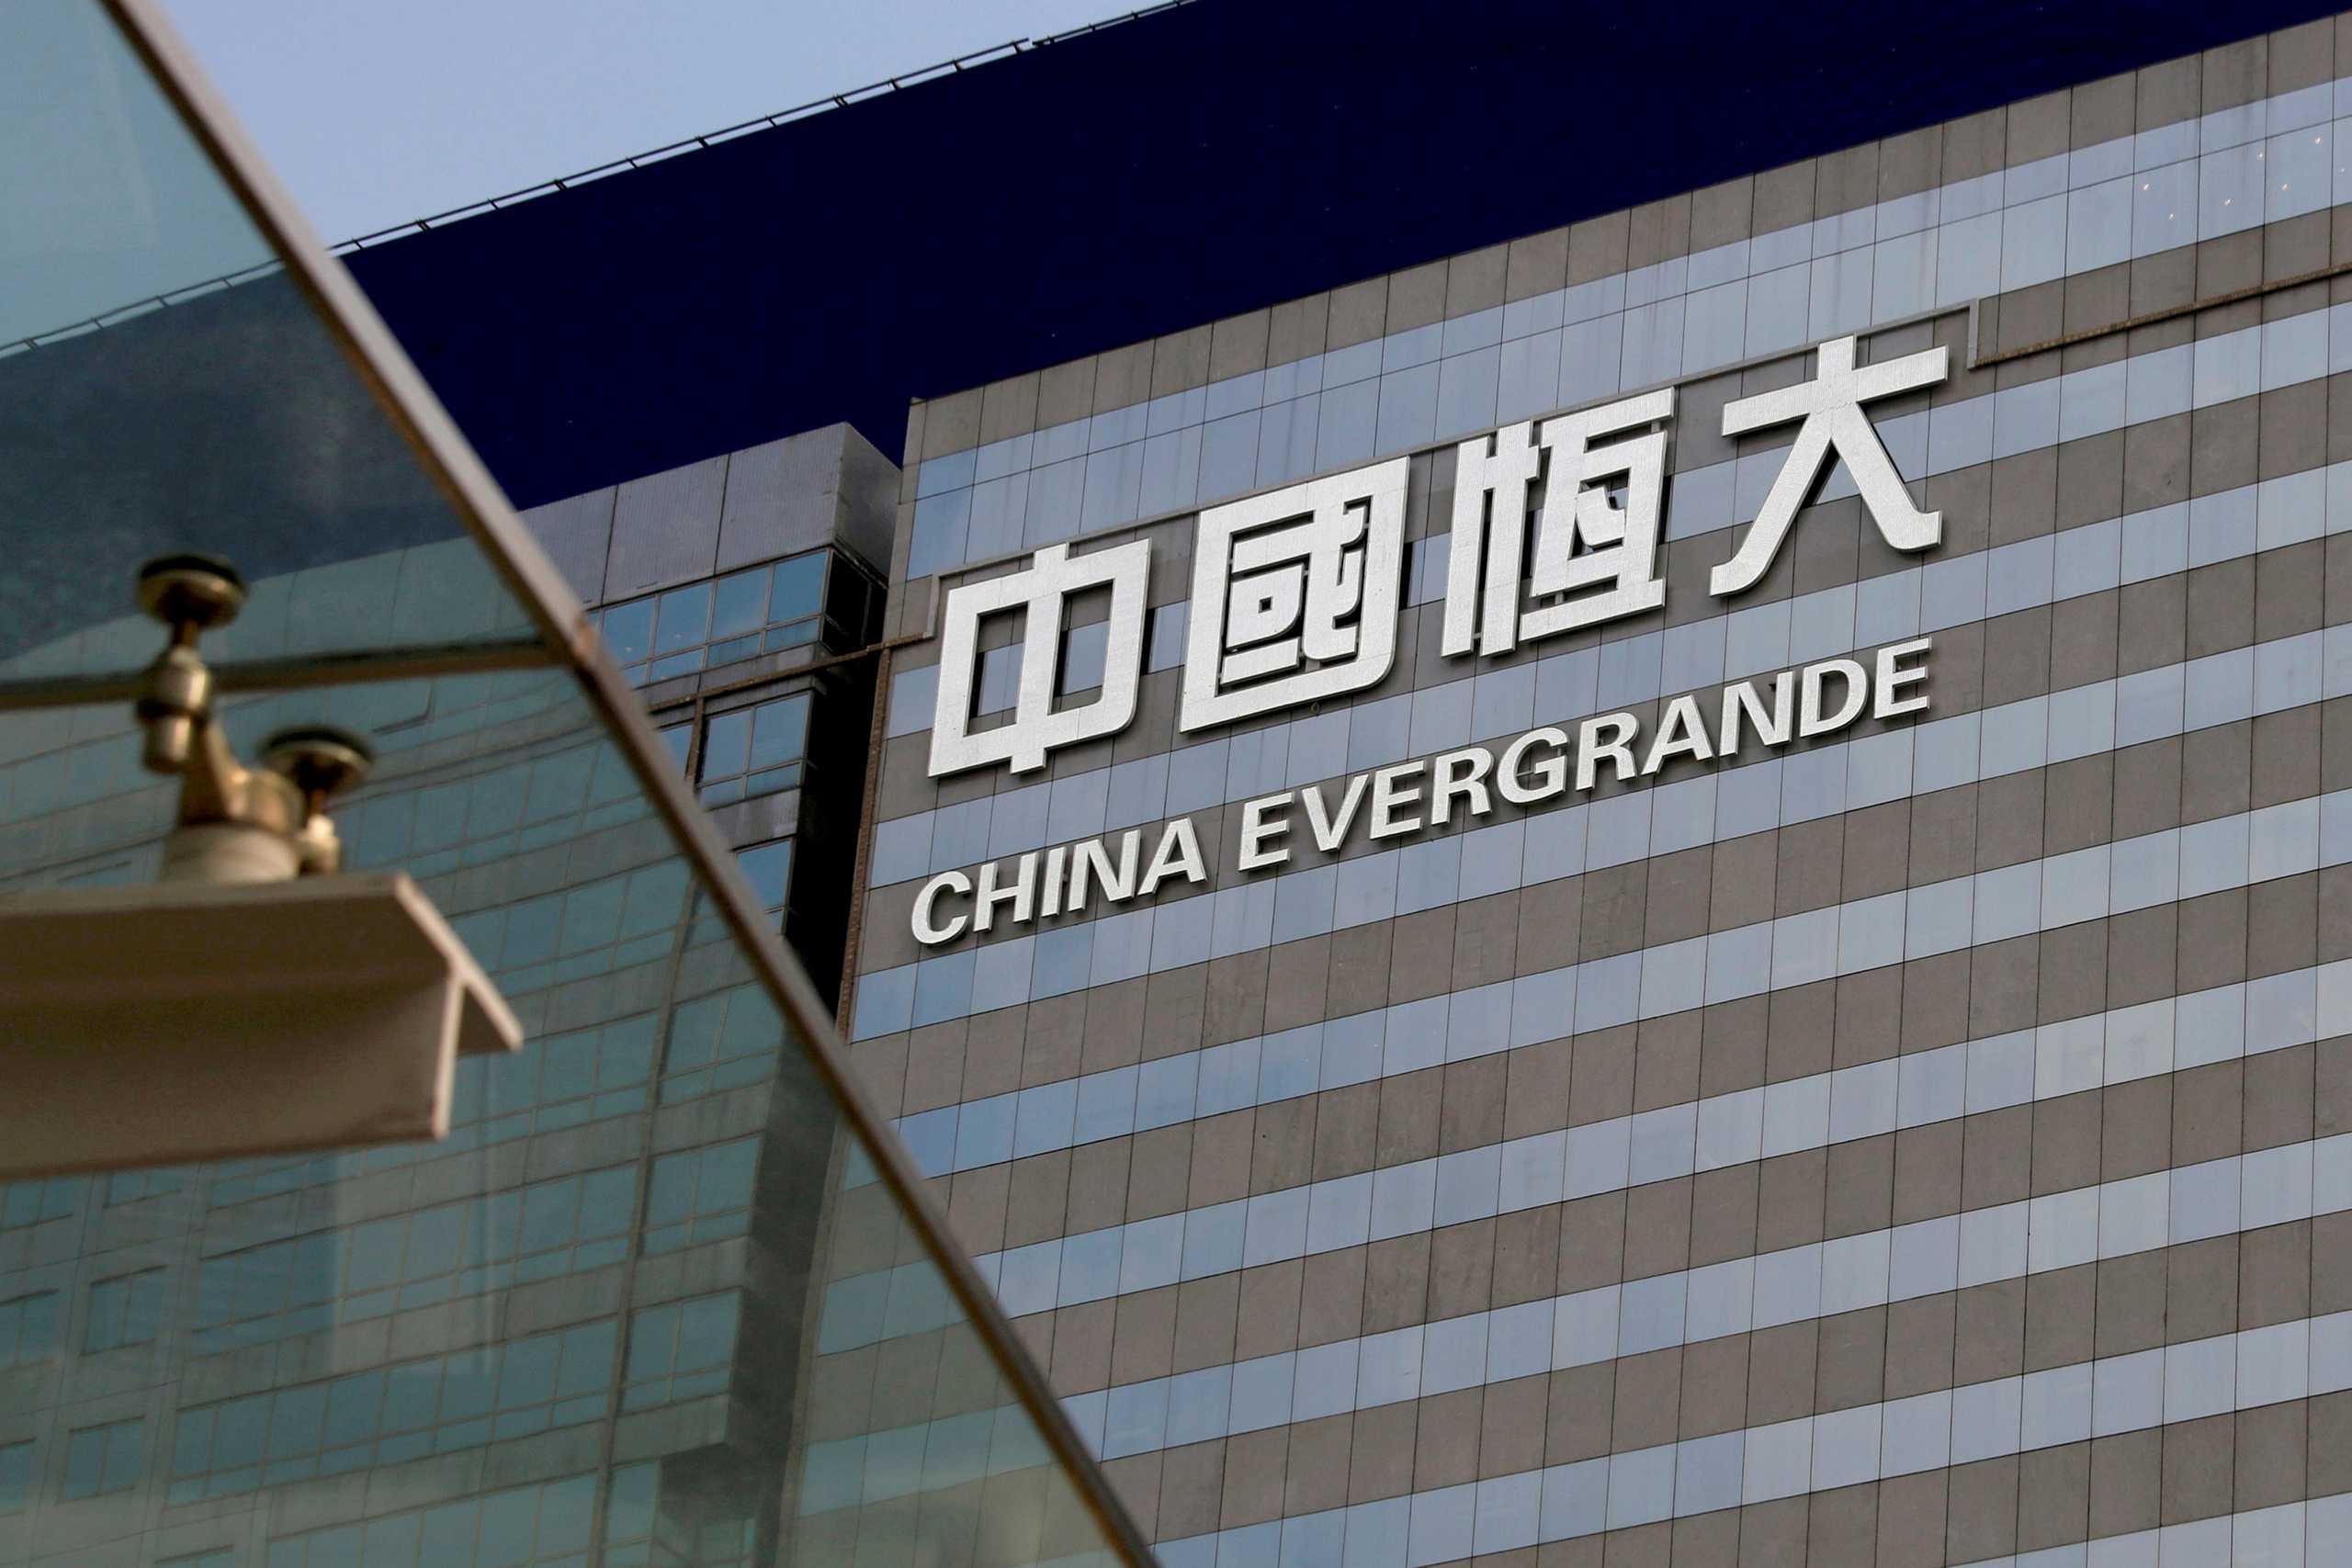 Evergrande: Πώς εμπλέκεται η Ελλάδα στην κατάρρευση του κινεζικού κολοσσού real estate